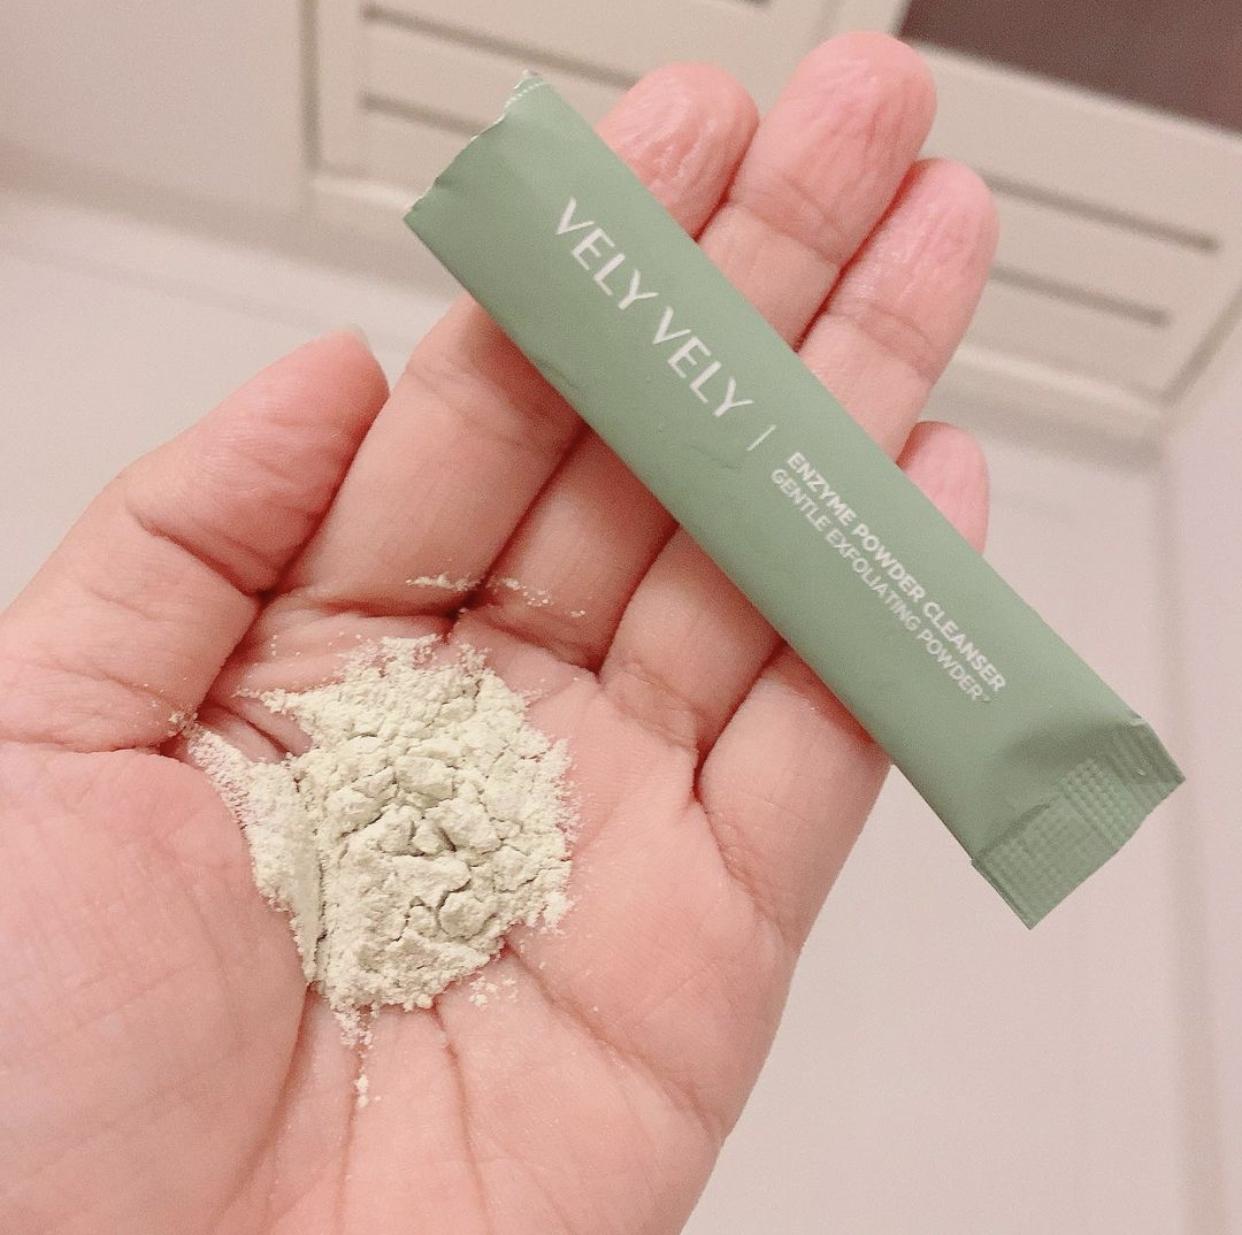 VELY VELY(ブリーブリー) 酵素洗顔パウダーを使ったYocchinさんのクチコミ画像2